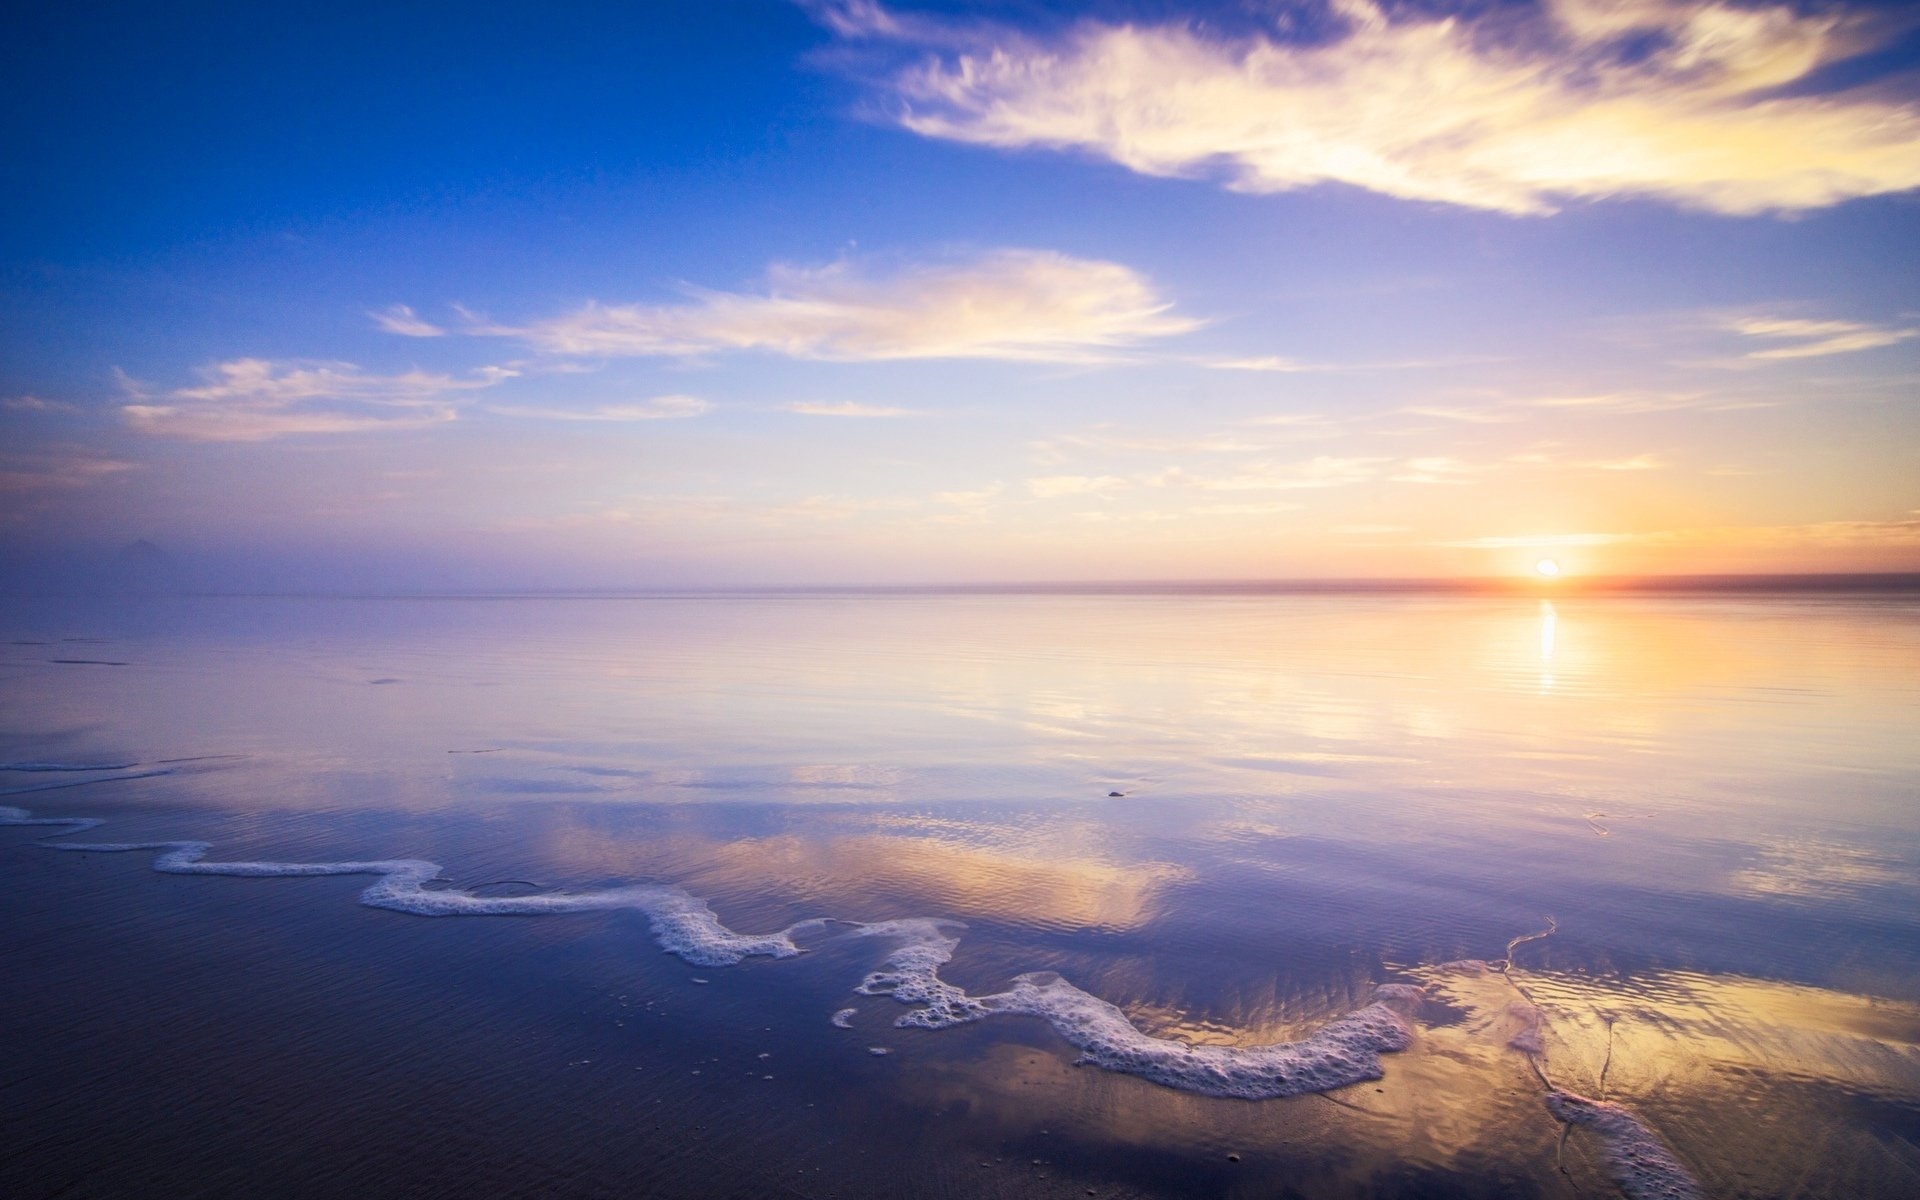 пейзаж п�и�ода мо�е �ека вода океан �олн�е �он обои